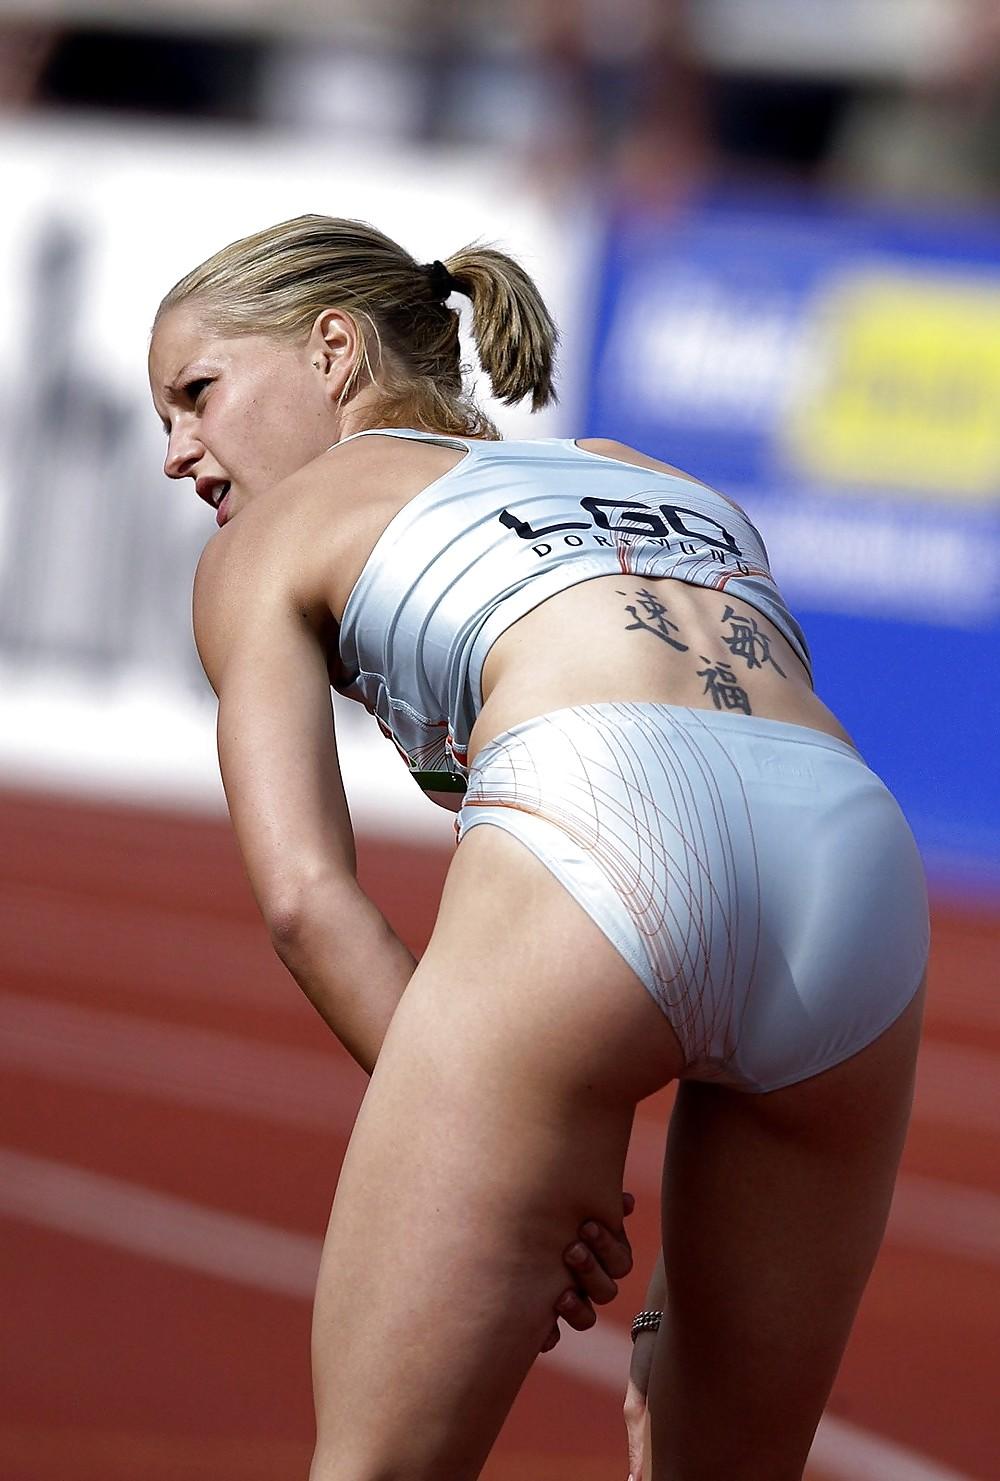 Voyeur sport women